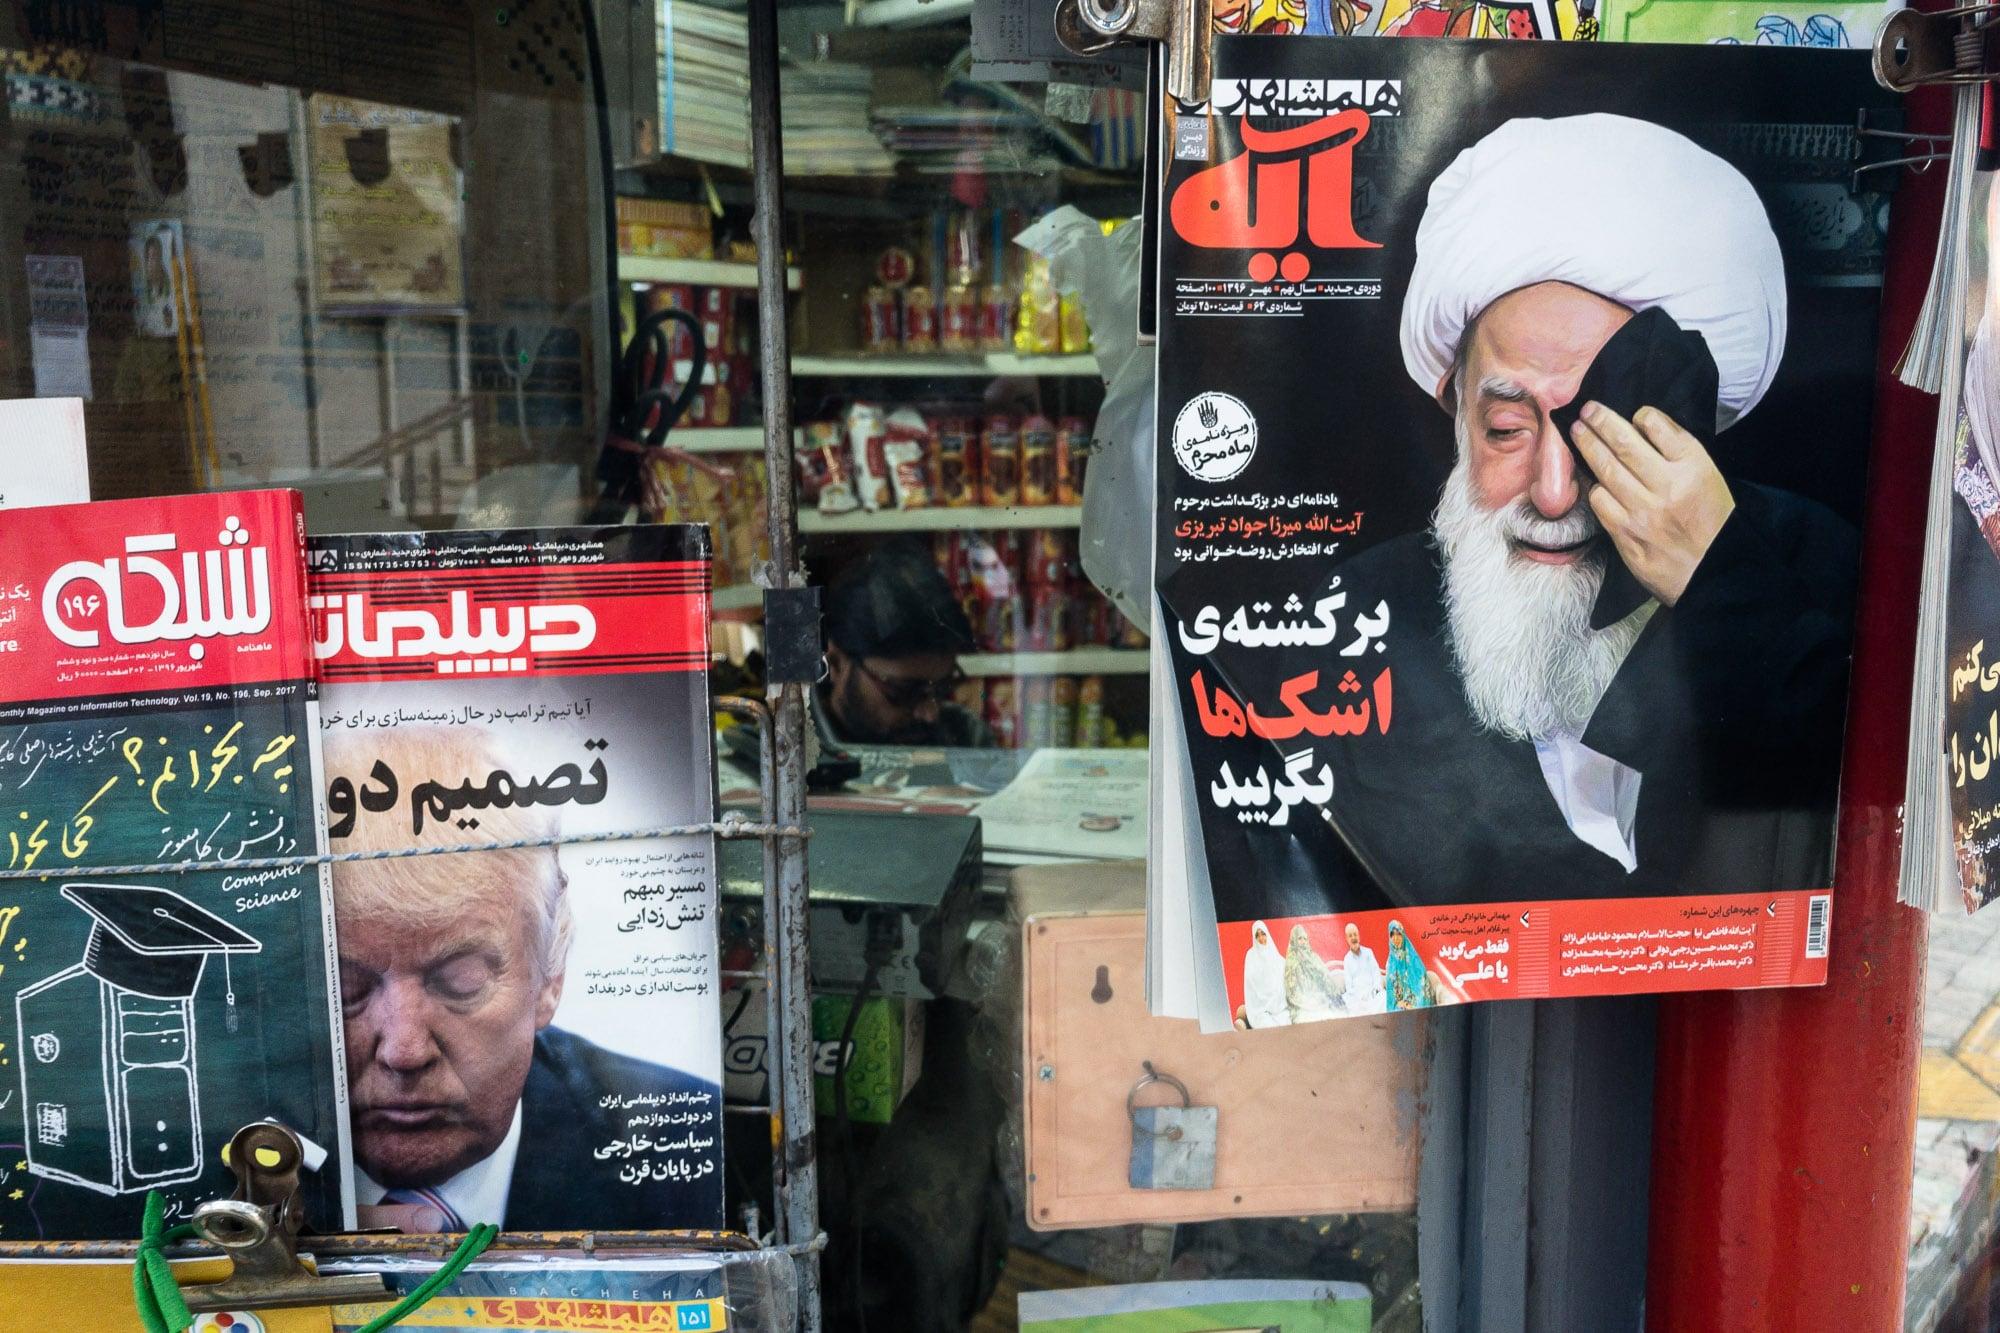 news stand in Mashhad